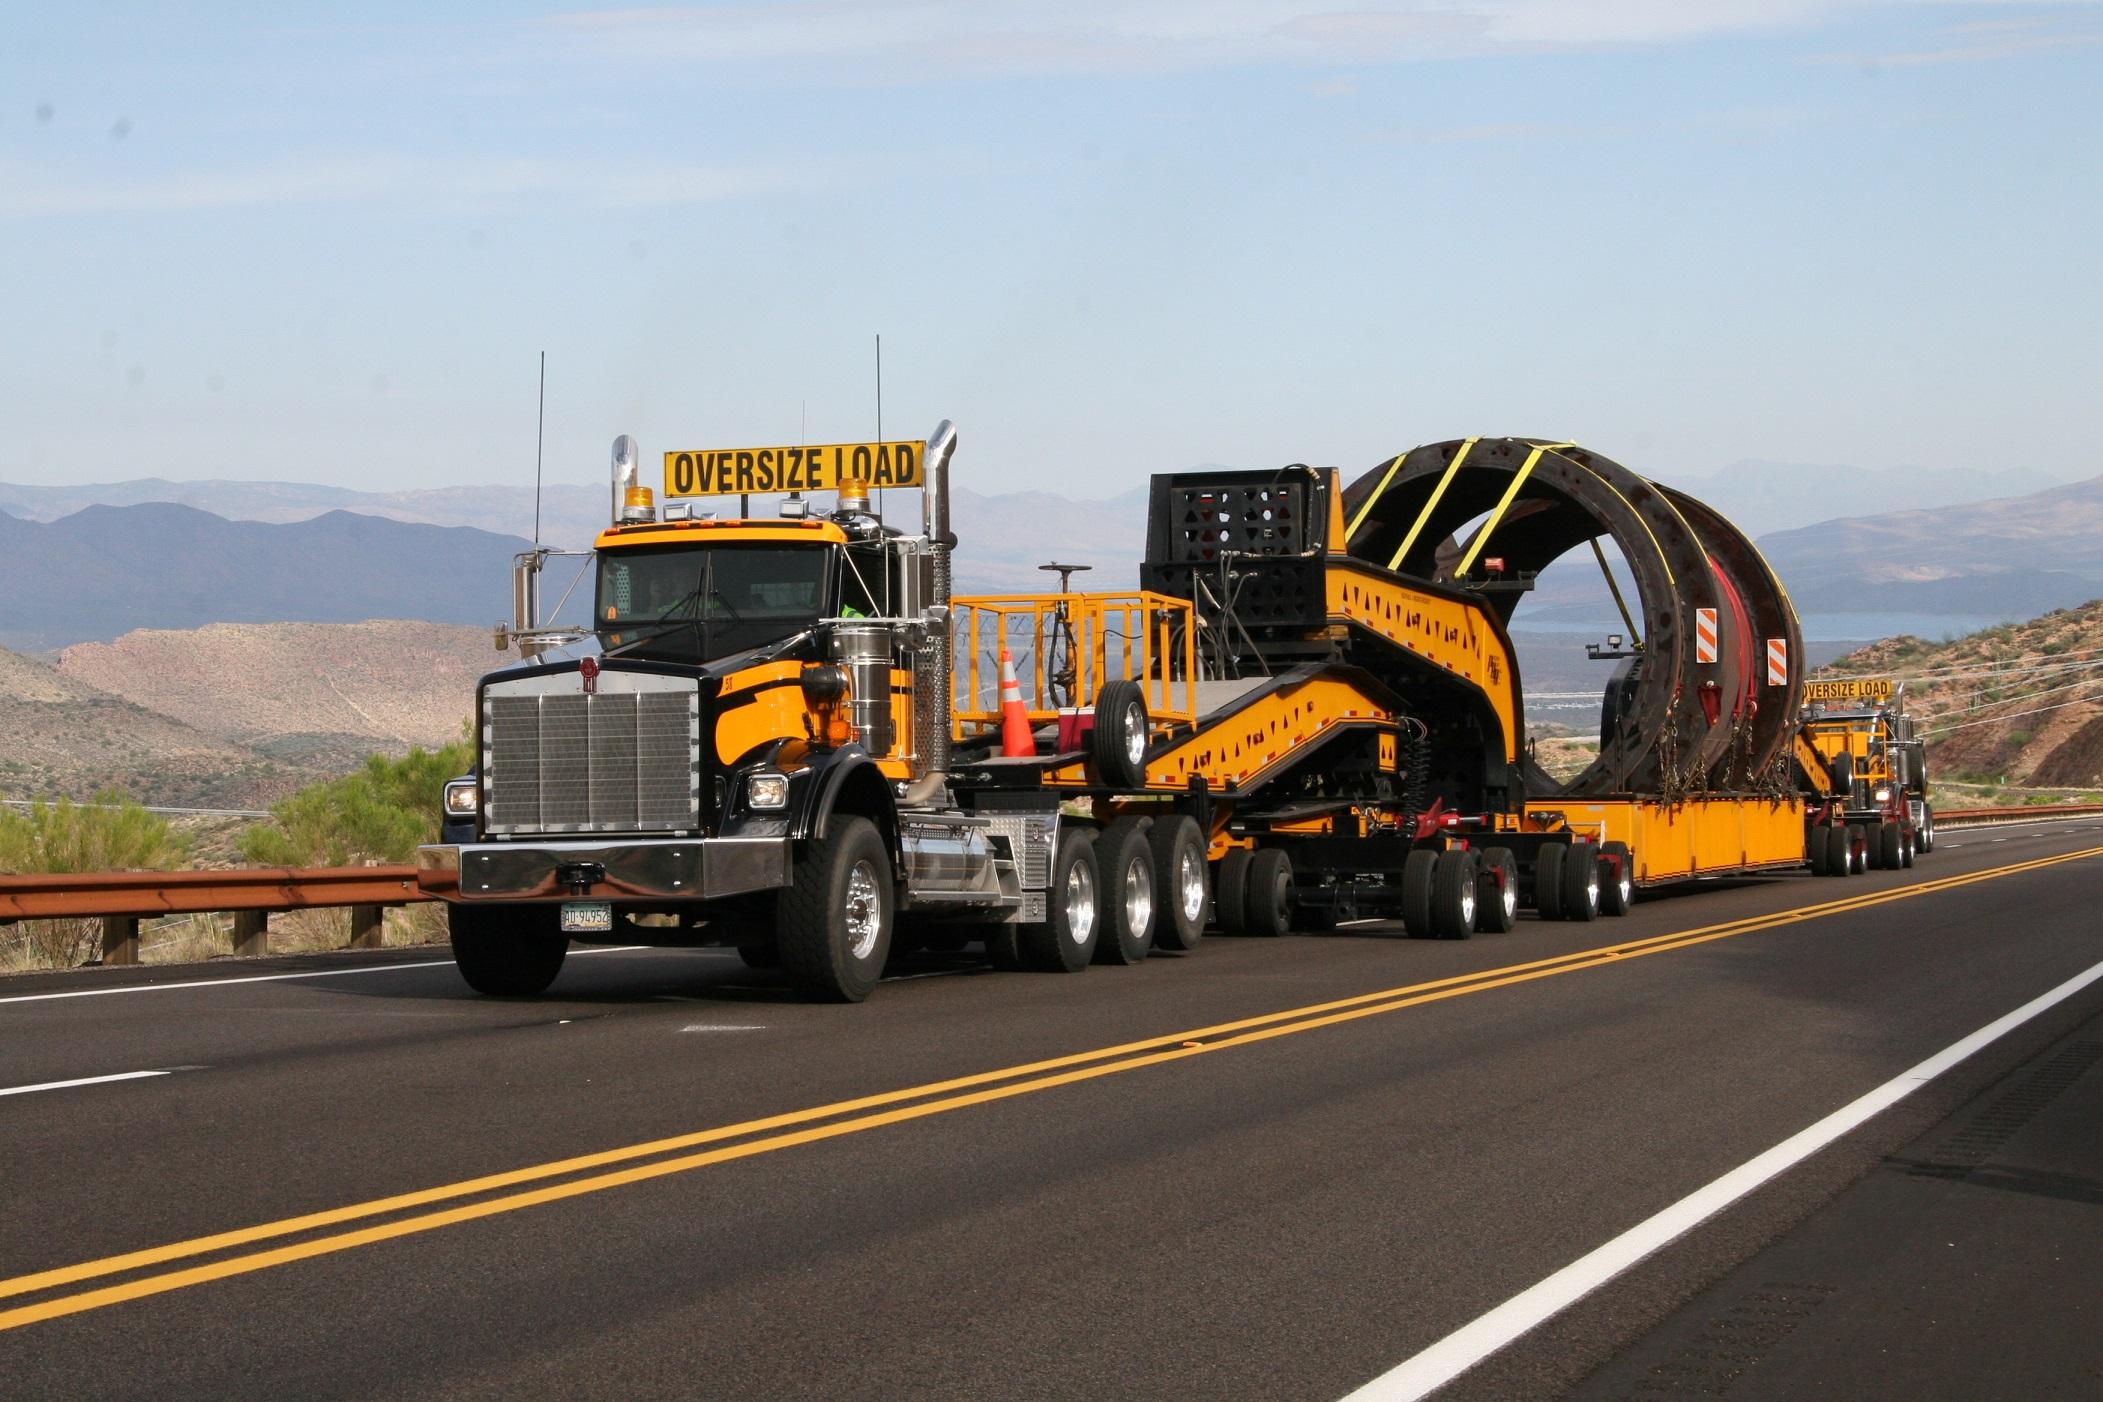 Truck Driver Salary >> How Do I Make More Money As a Truck Driver? Truck Driver Pay - Class A Drivers